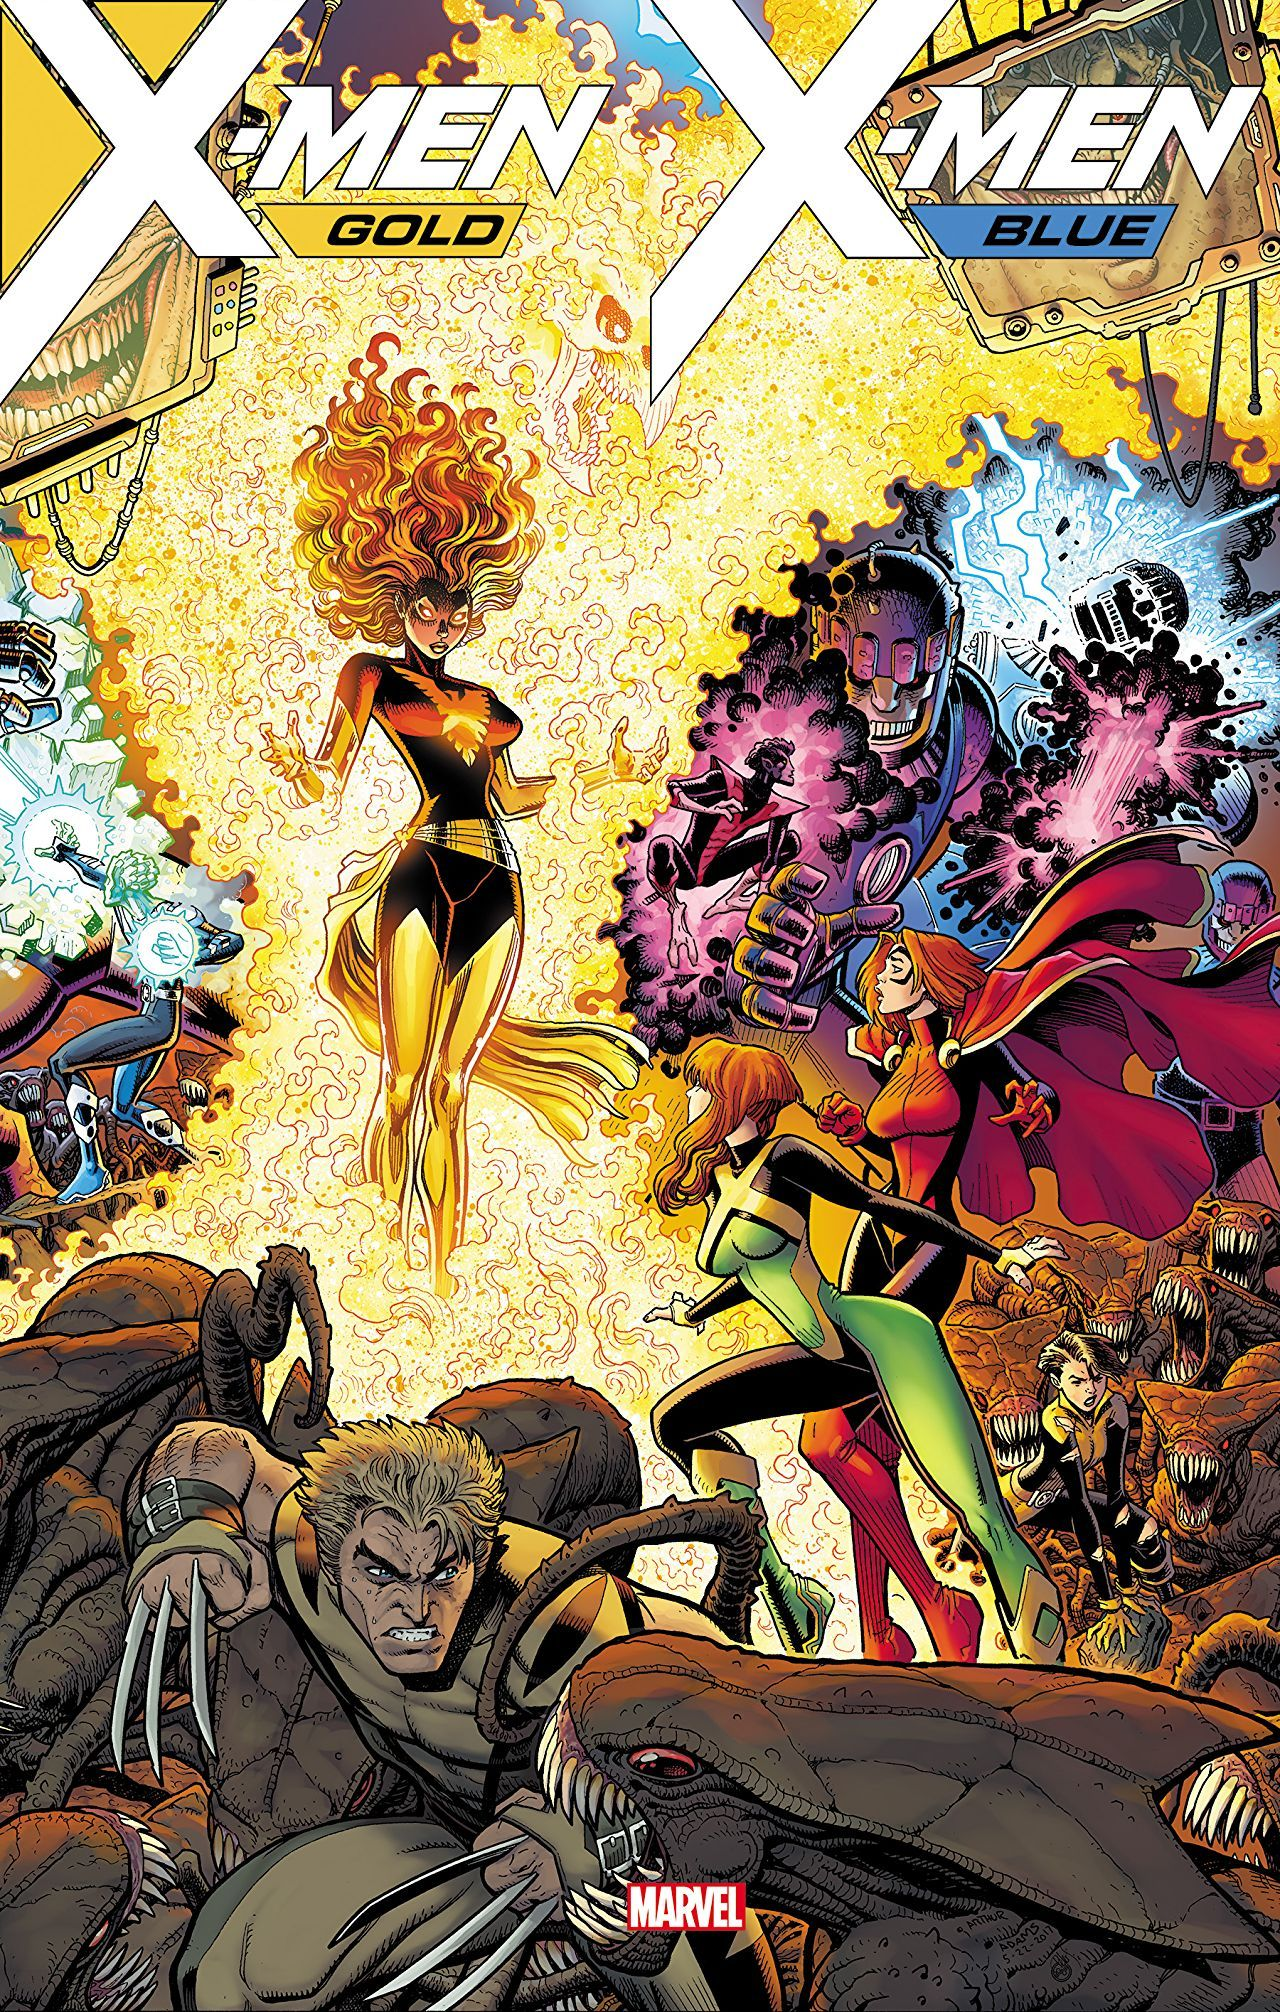 X-Men Gold Vol. 3: Mojo Worldwide - W.B. | My Pop Culture, MARVEL ...